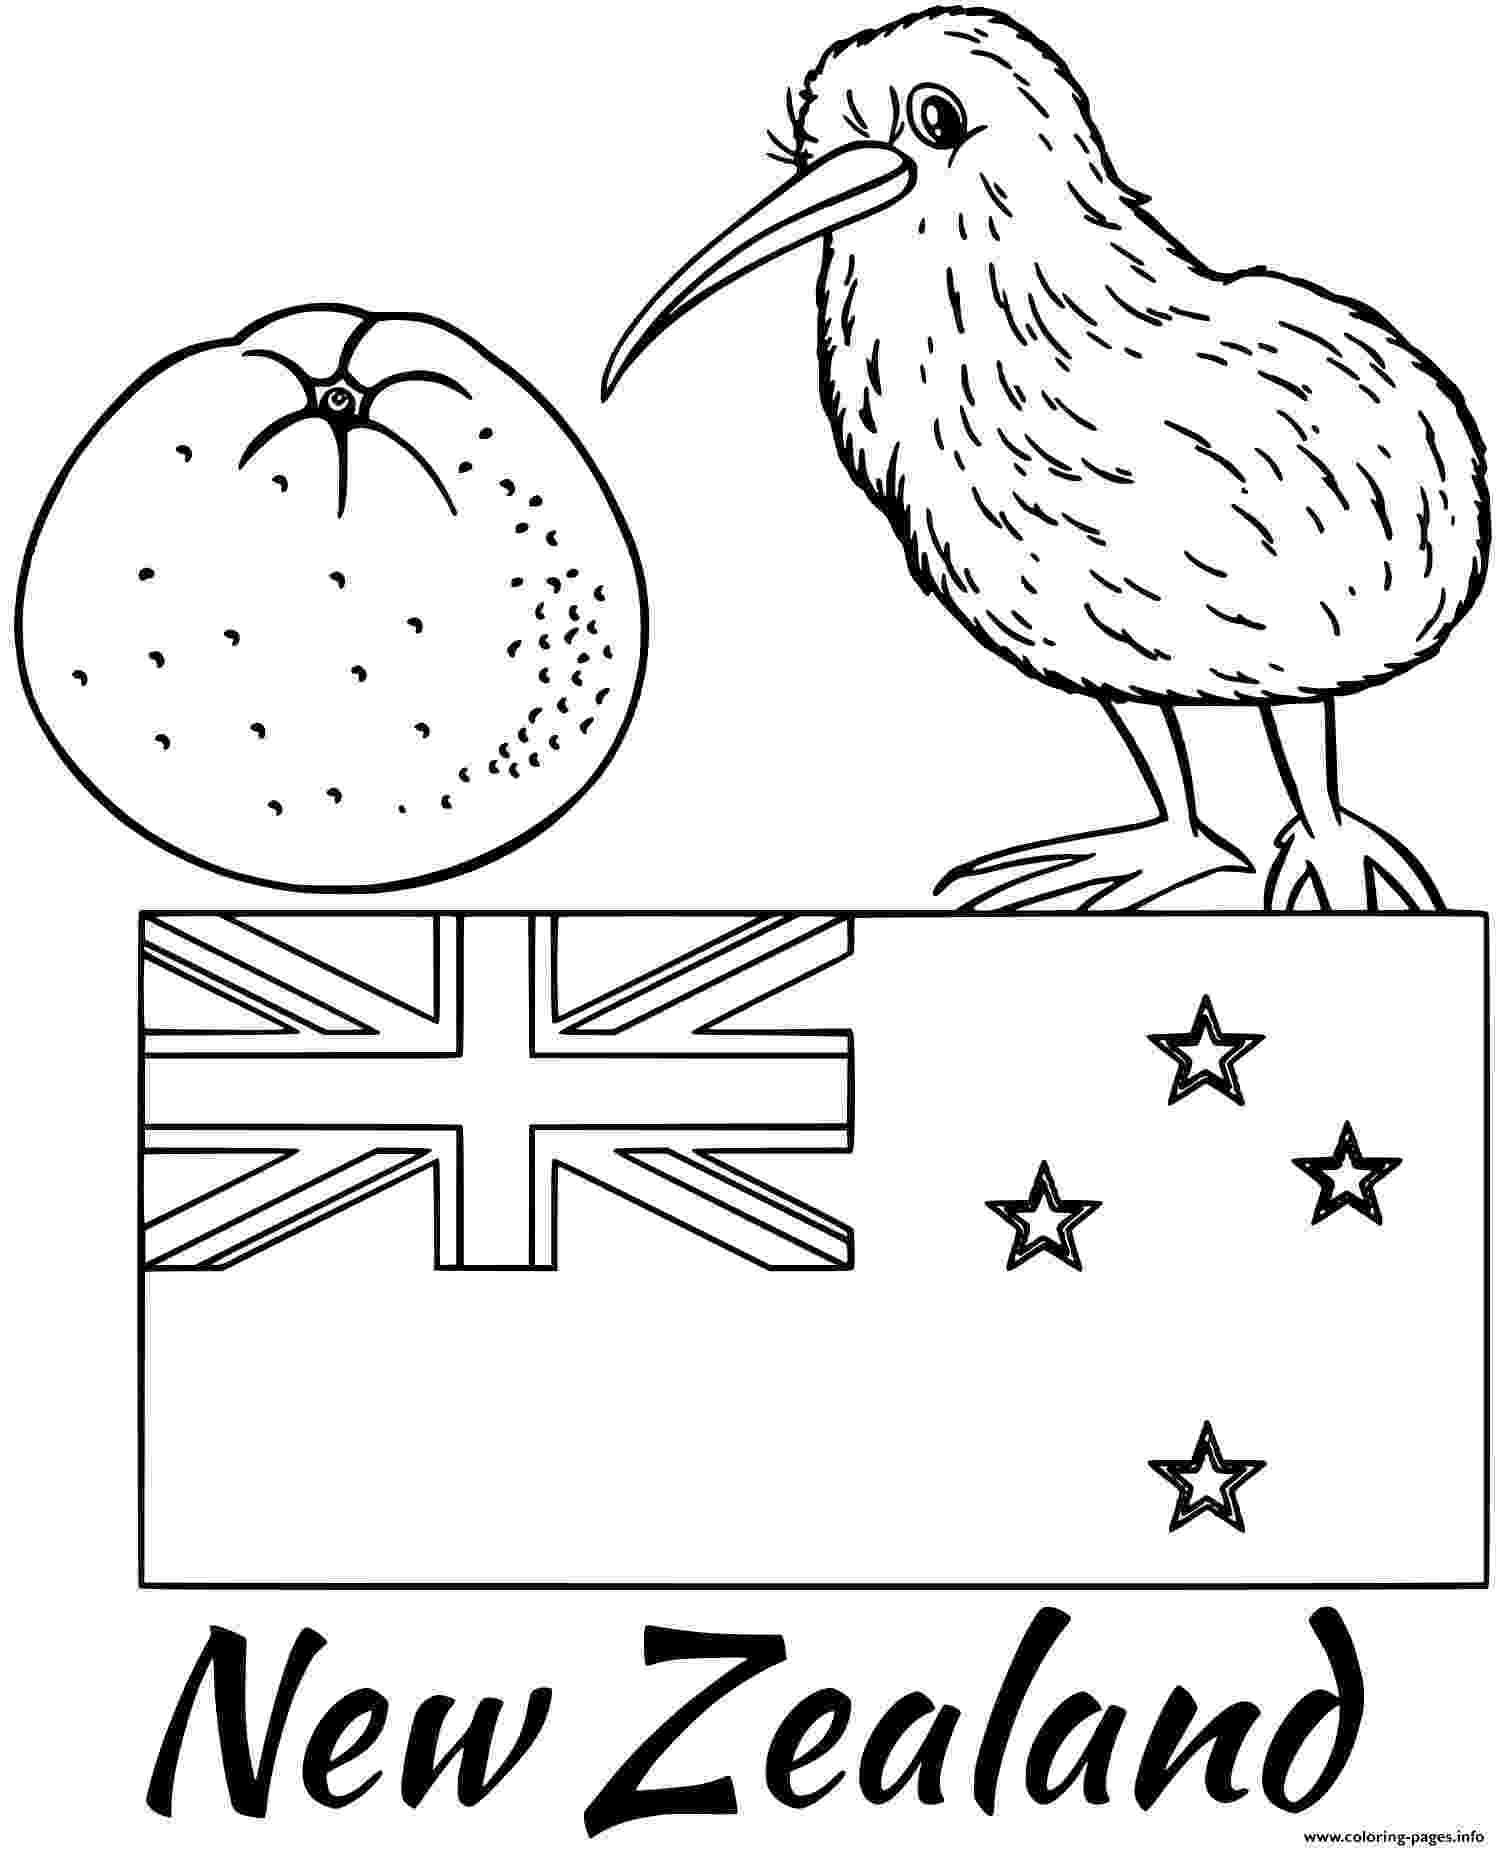 new zealand flag coloring page new zealand flag kiwi coloring pages printable new page coloring flag zealand